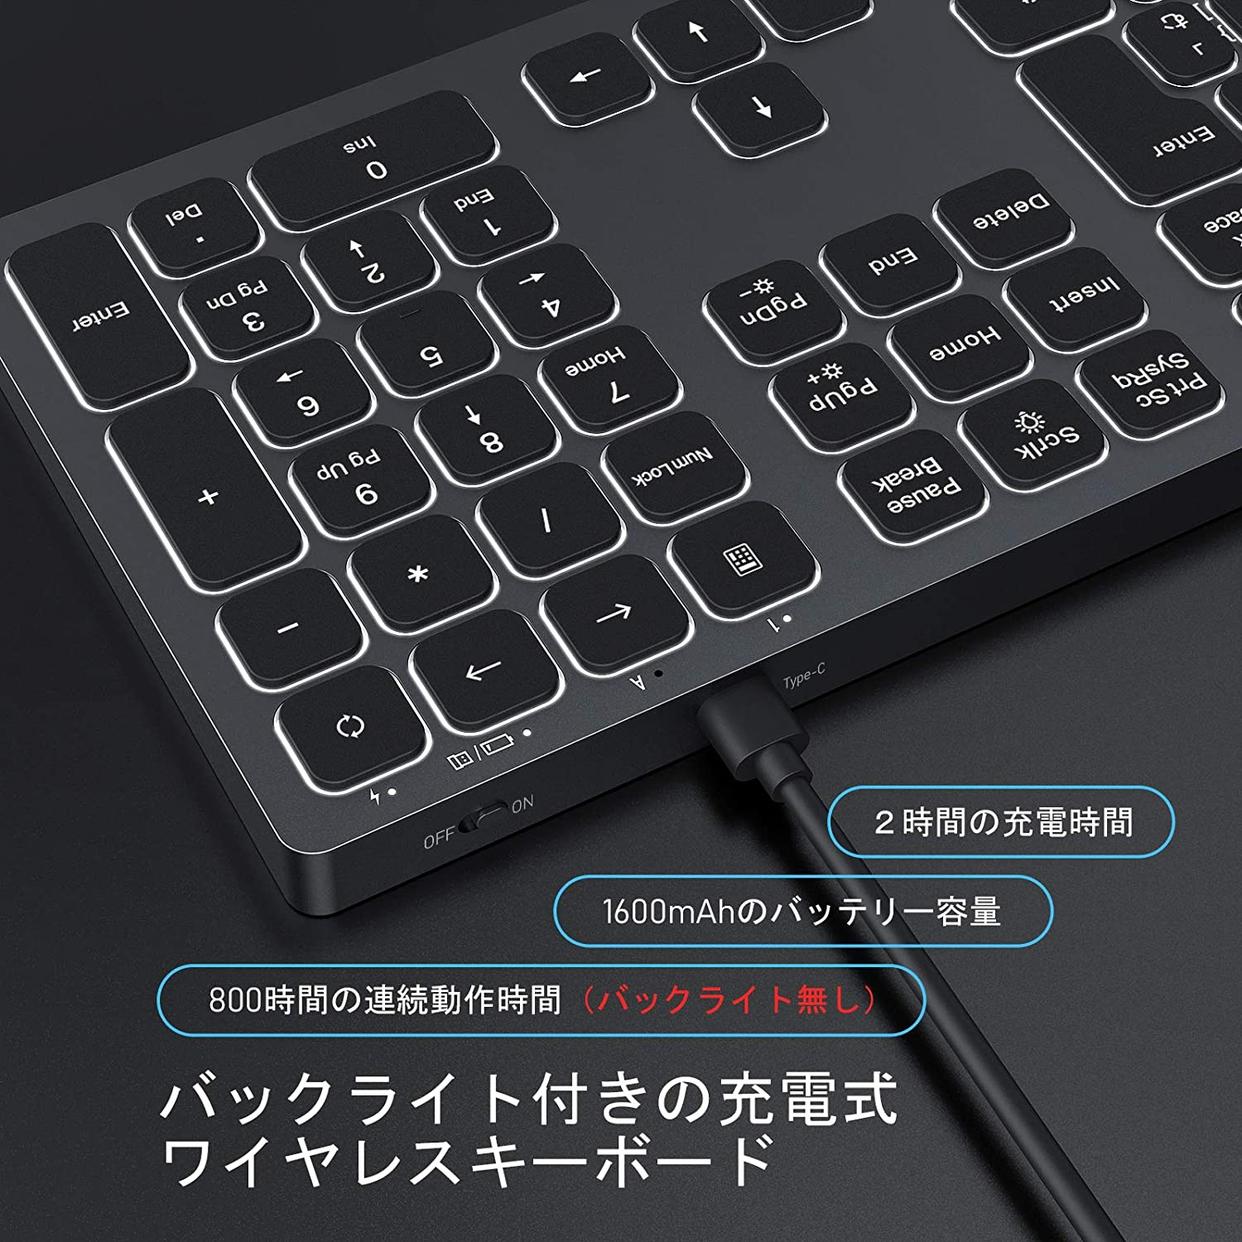 seenda Bluetooth キーボードの商品画像4